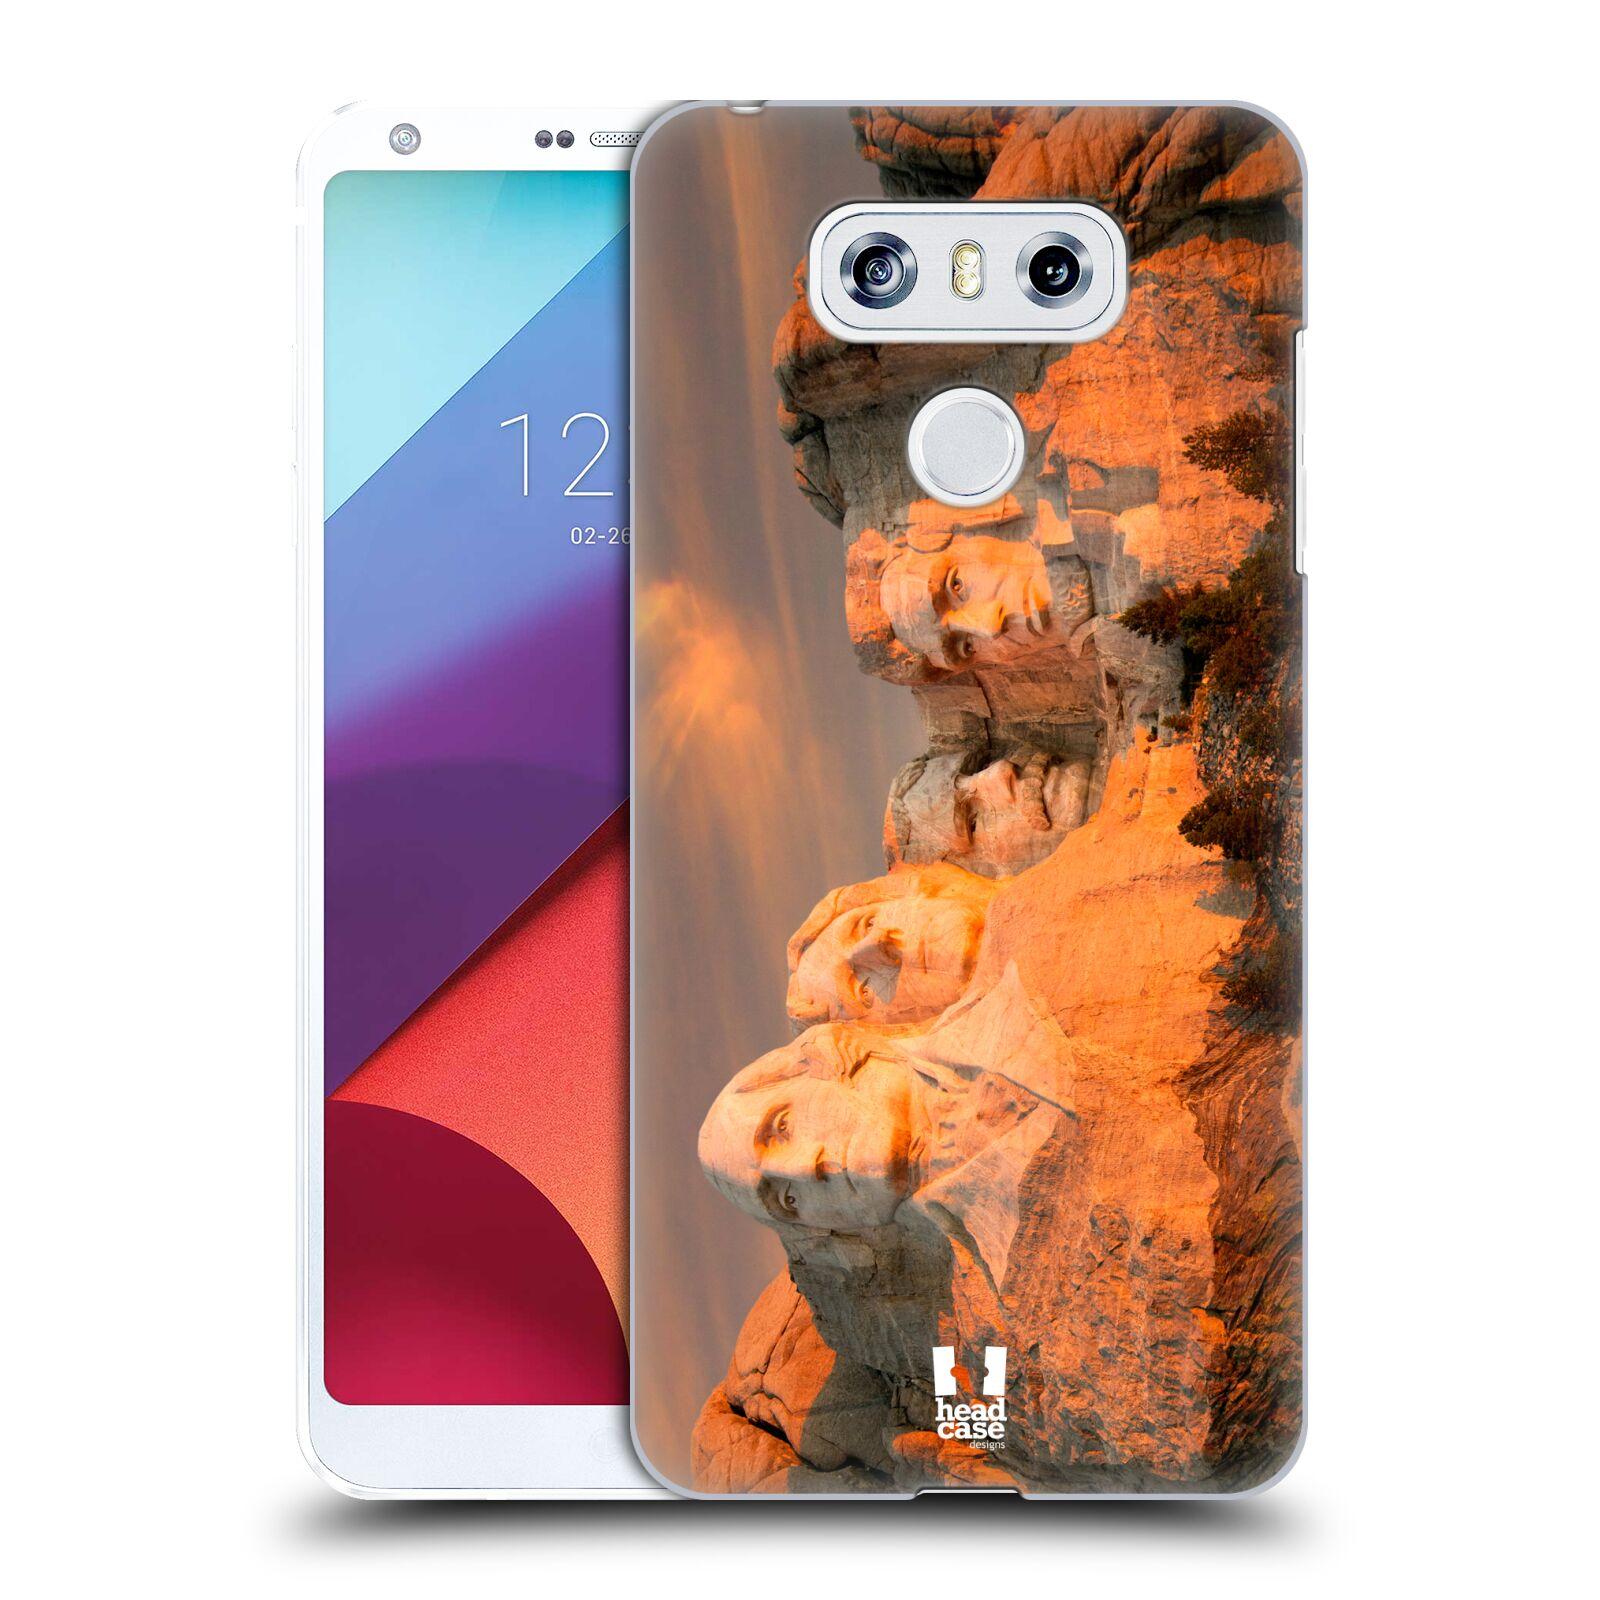 Funda HEAD CASE DESIGNS famosos monumentos Dorso duro caso para LG G6